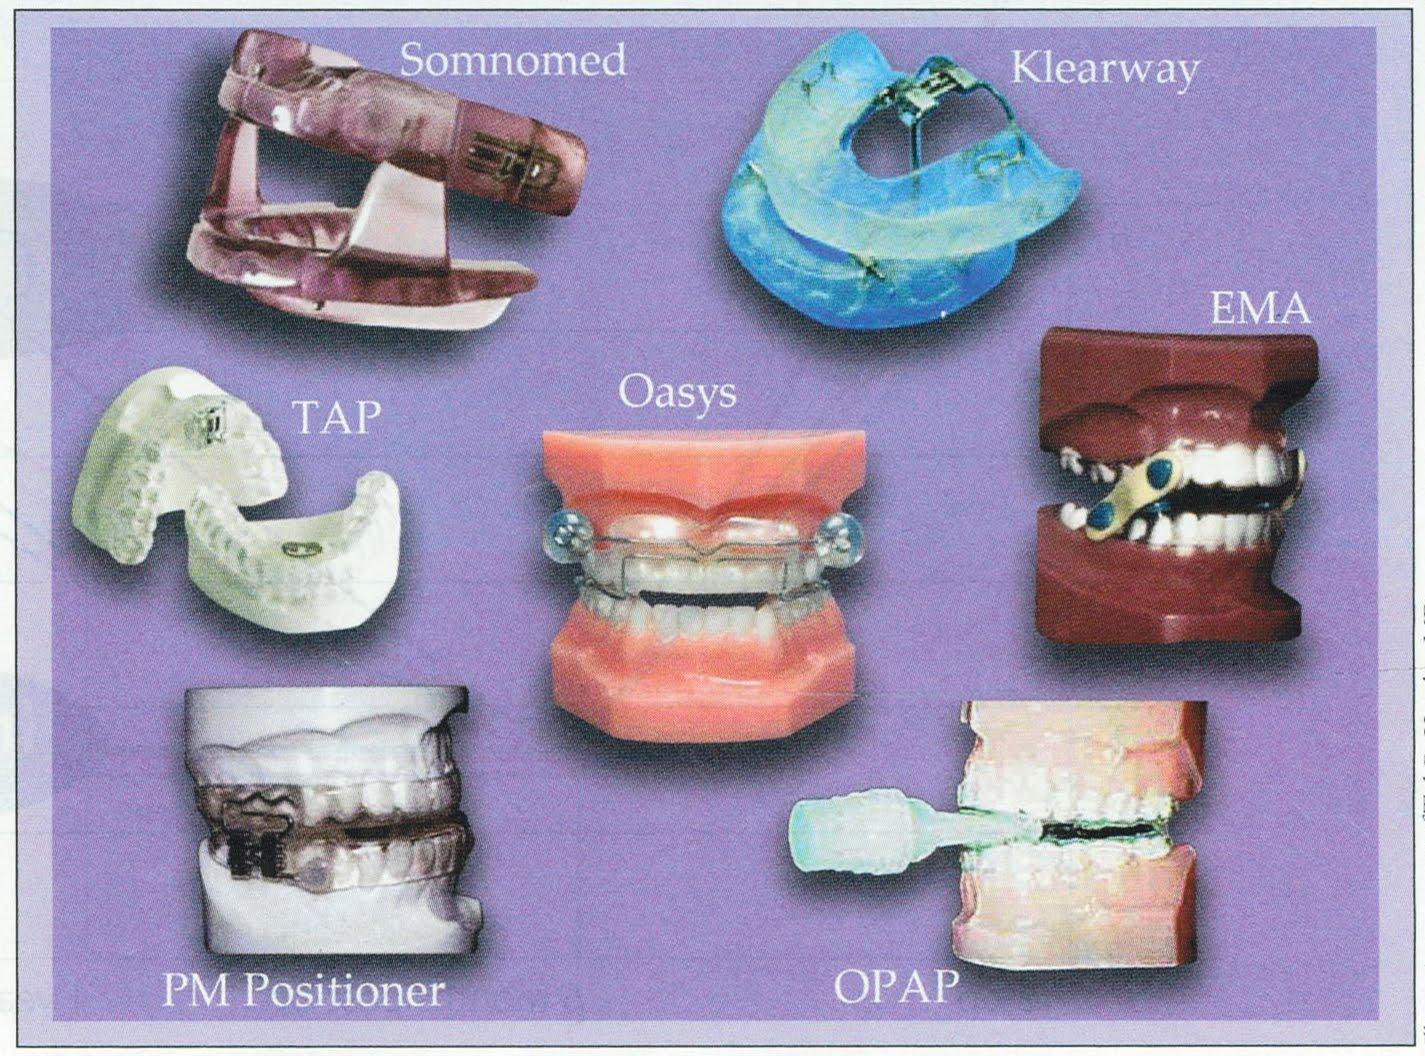 Oral Appliances To Help Correct Obstructive Sleep Apnea Osa